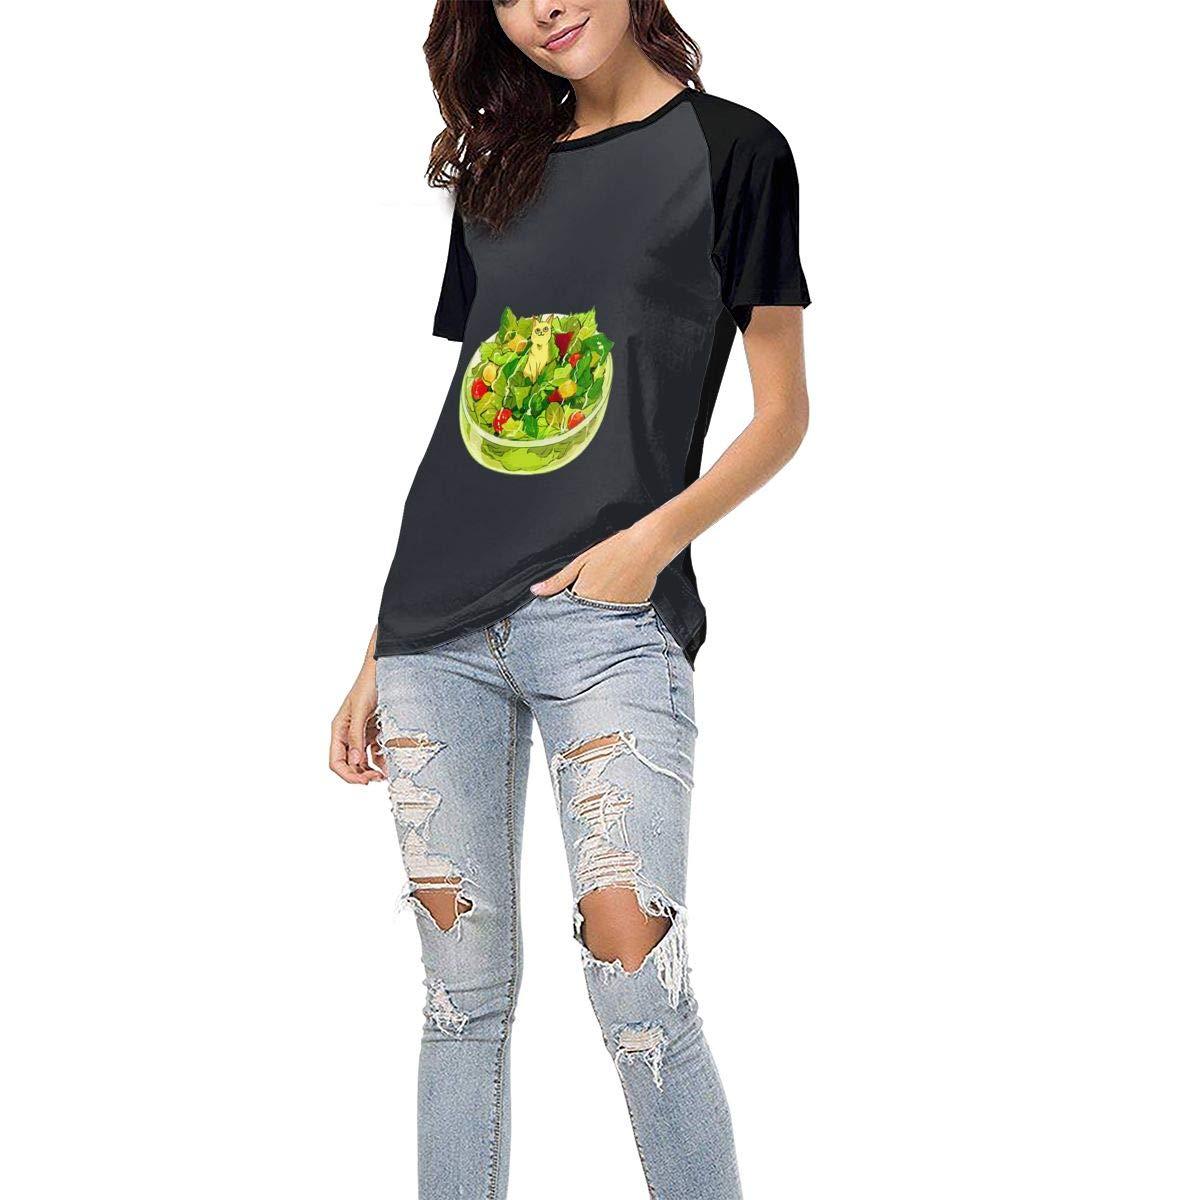 QWXZC Salad Womens Short Sleeves Baseball Tee Casual Raglan Shirt Baseball Raglan T-Shirt.Black.